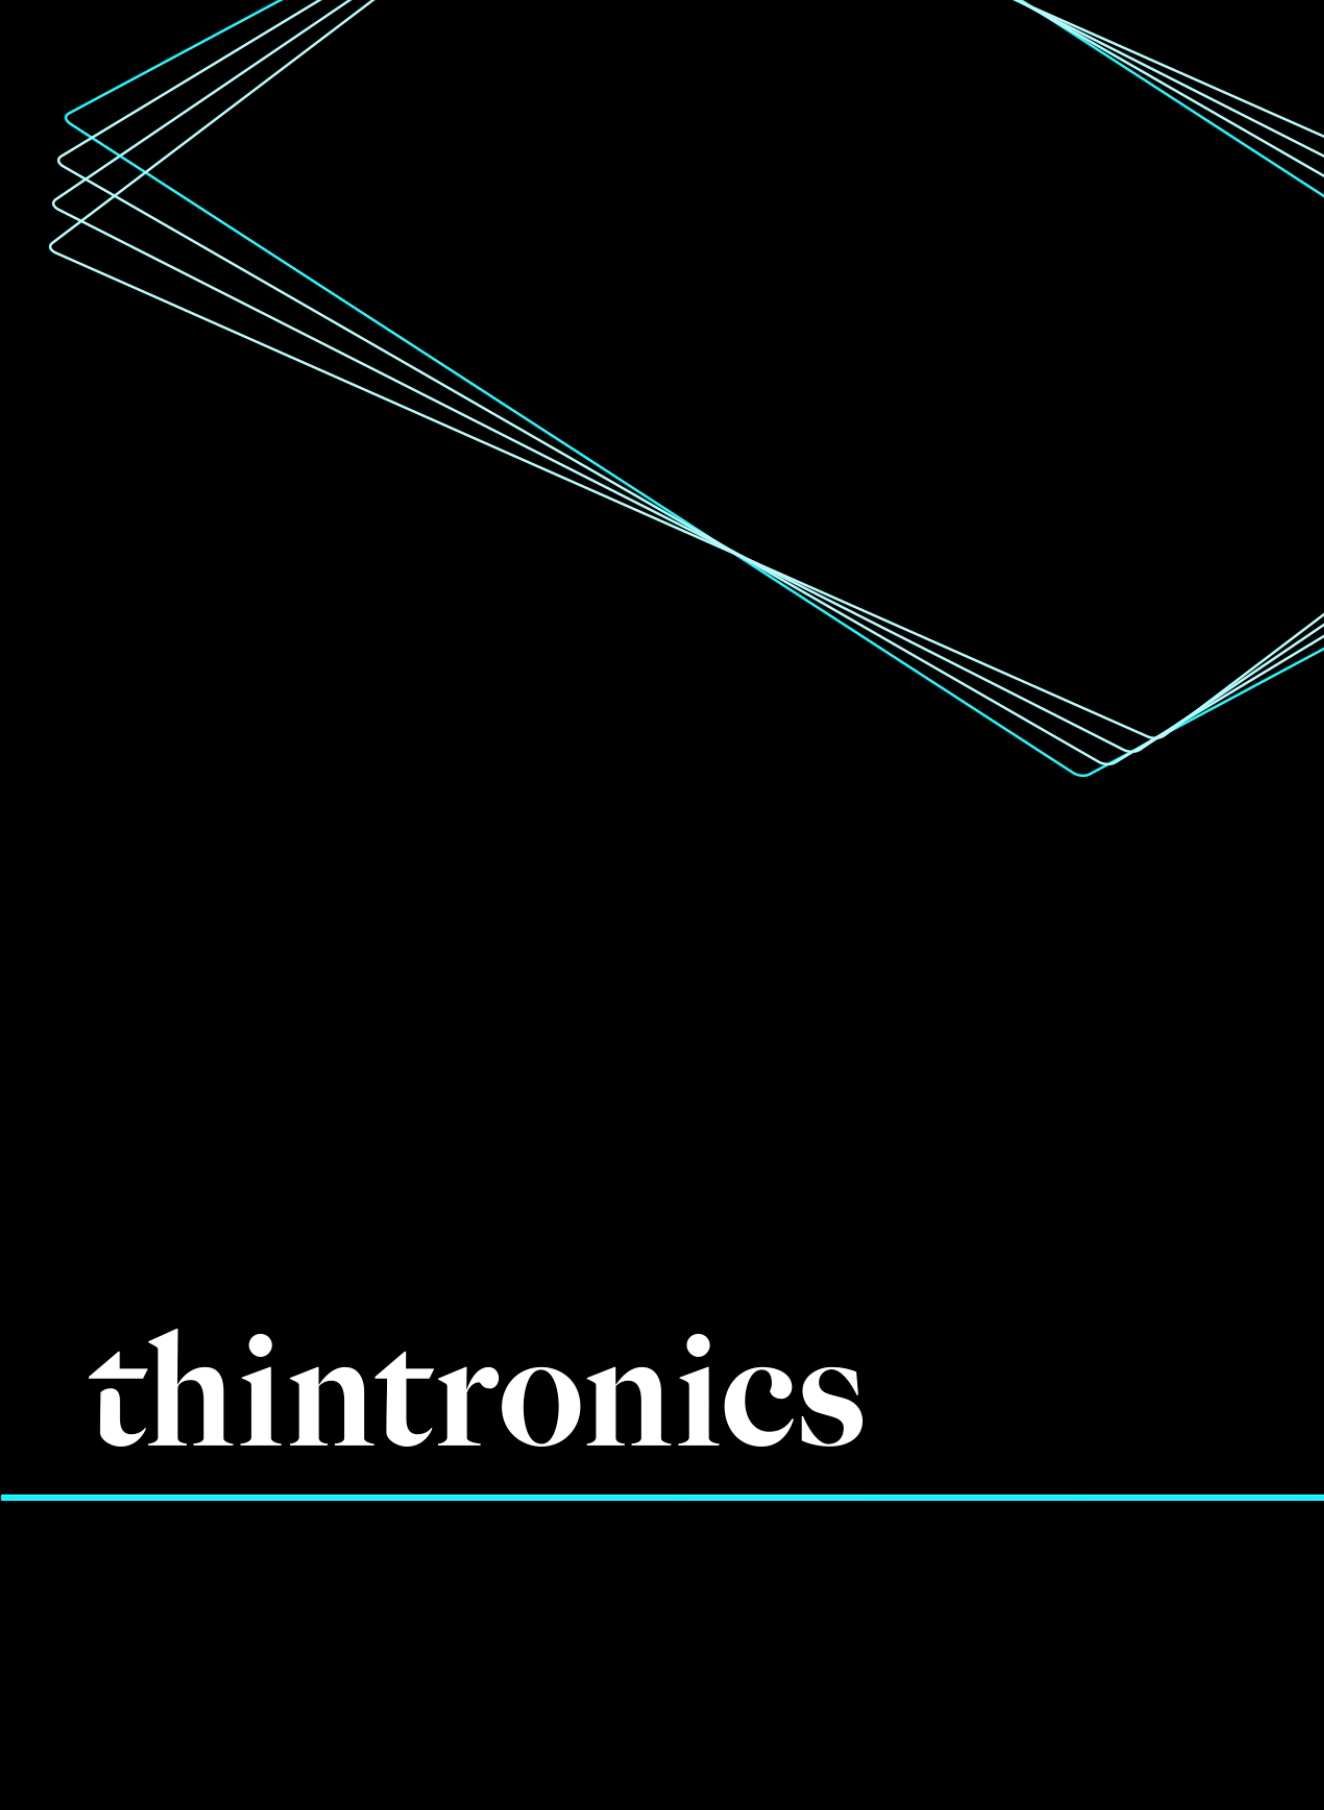 Thintronics